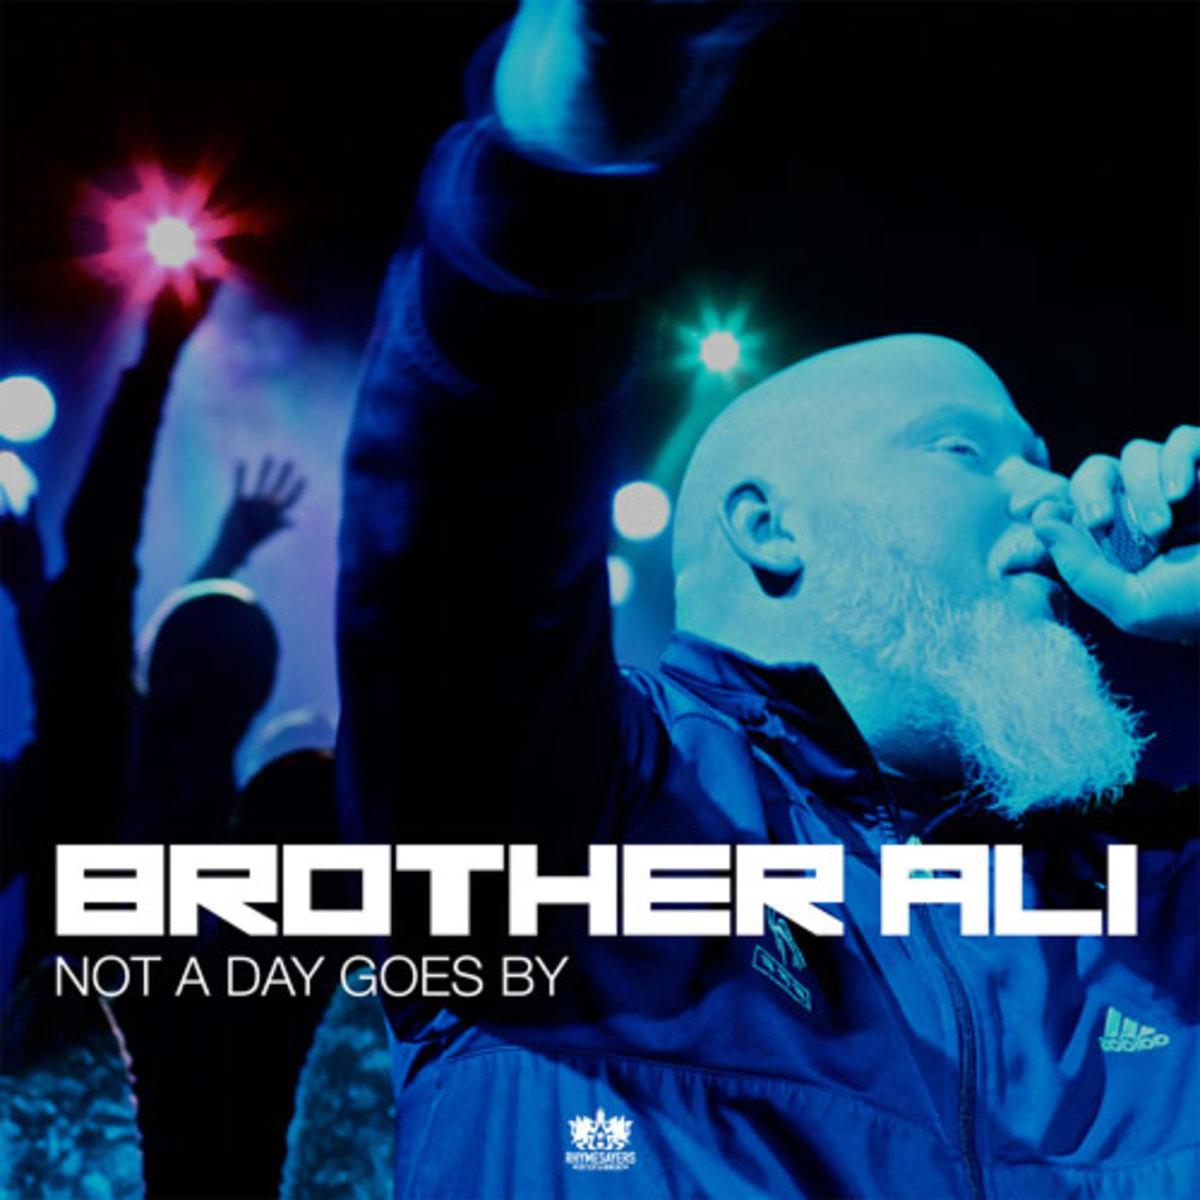 brotherali-notadaygoesby.jpg